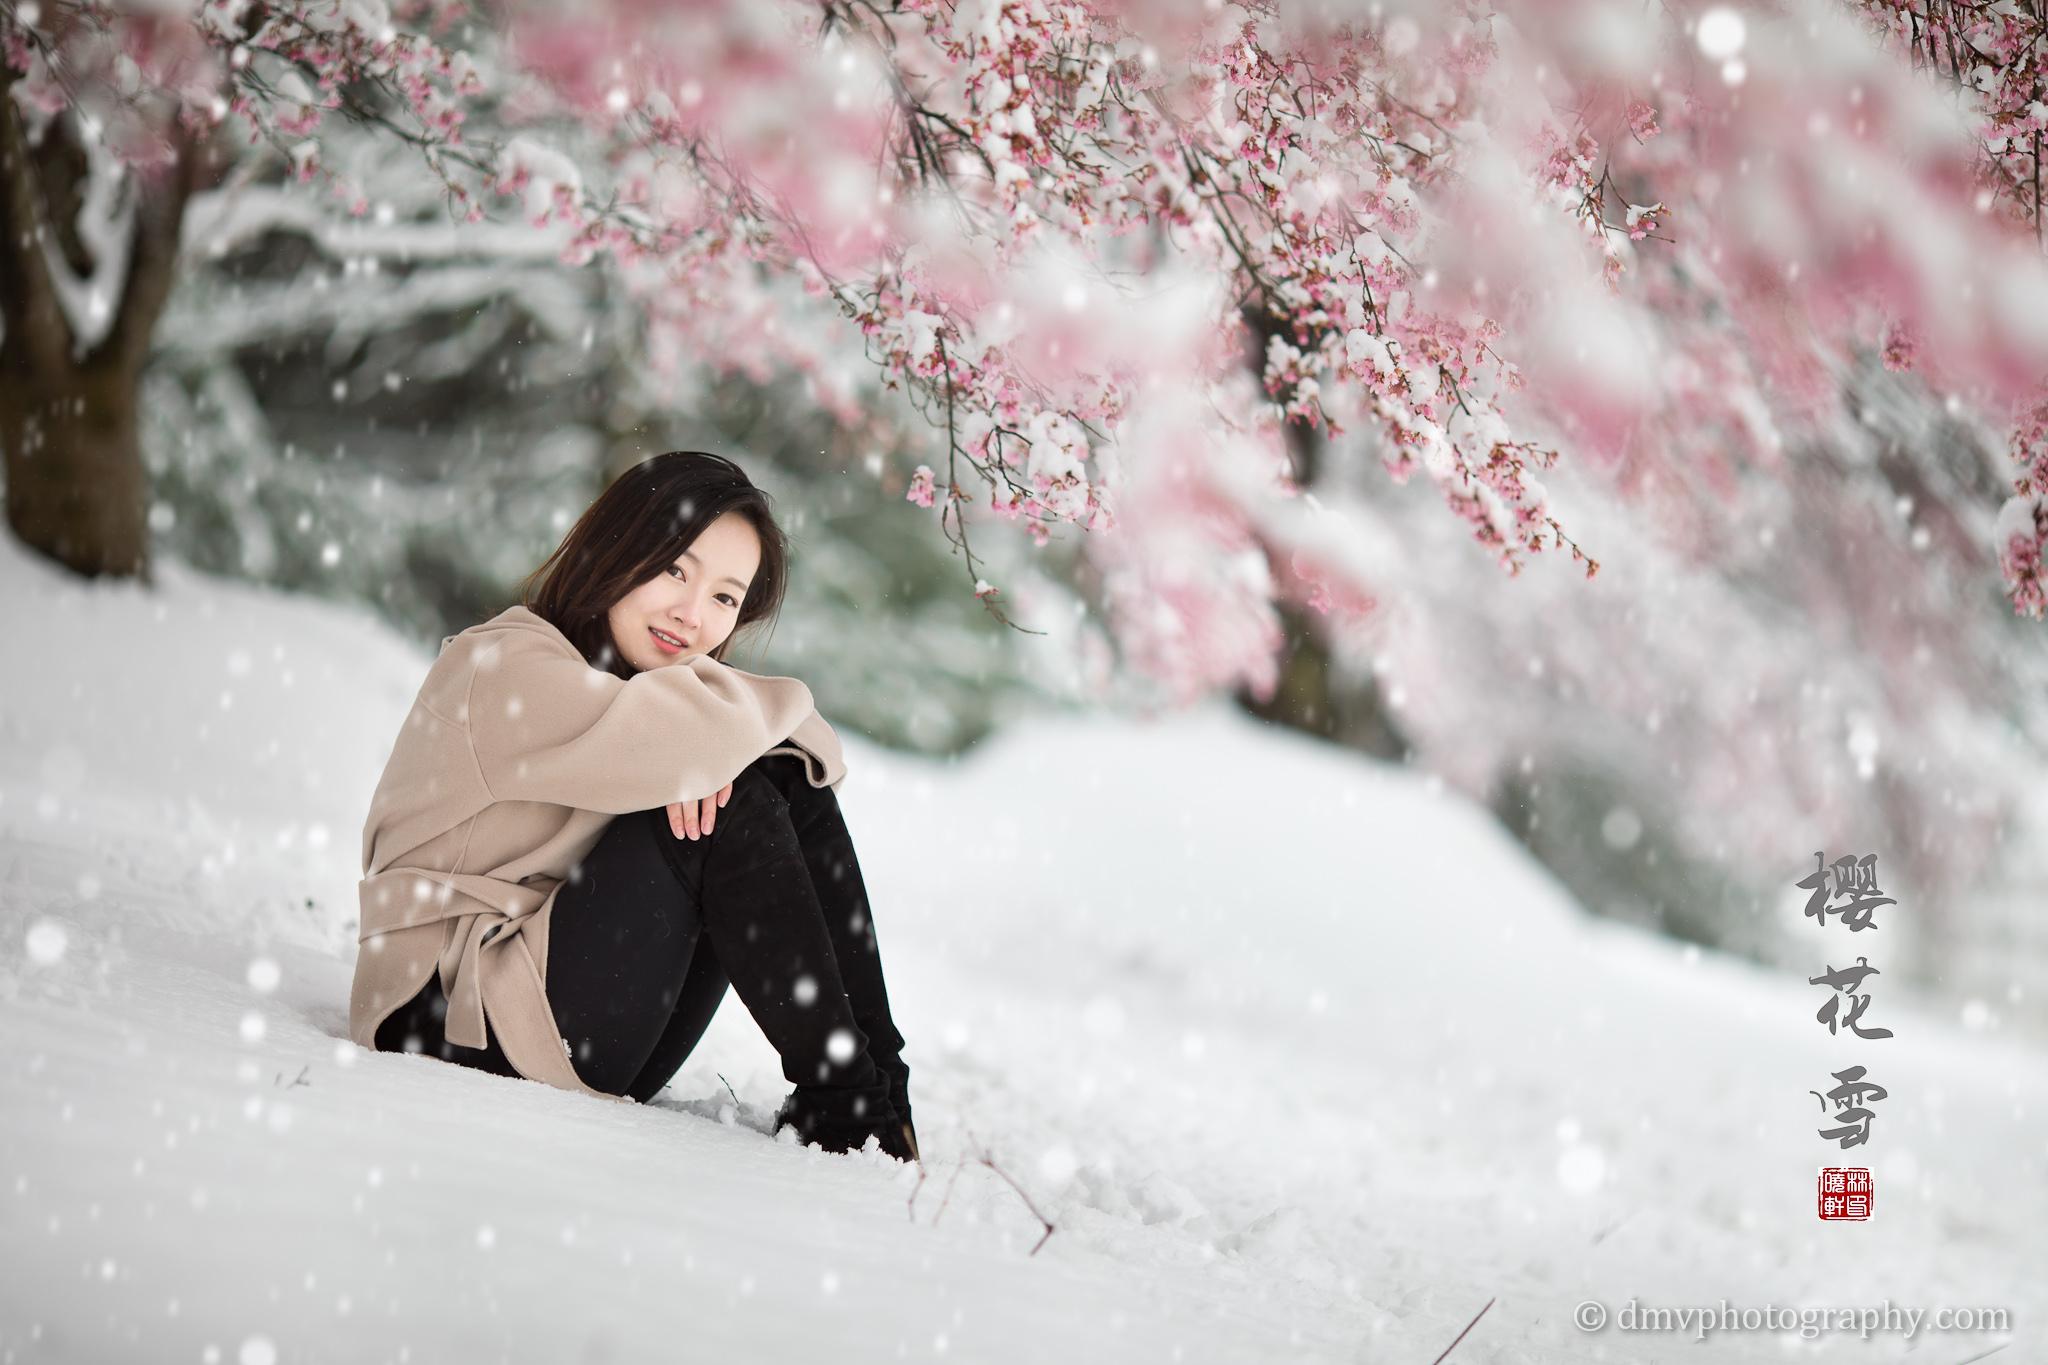 _D4_8473-snow